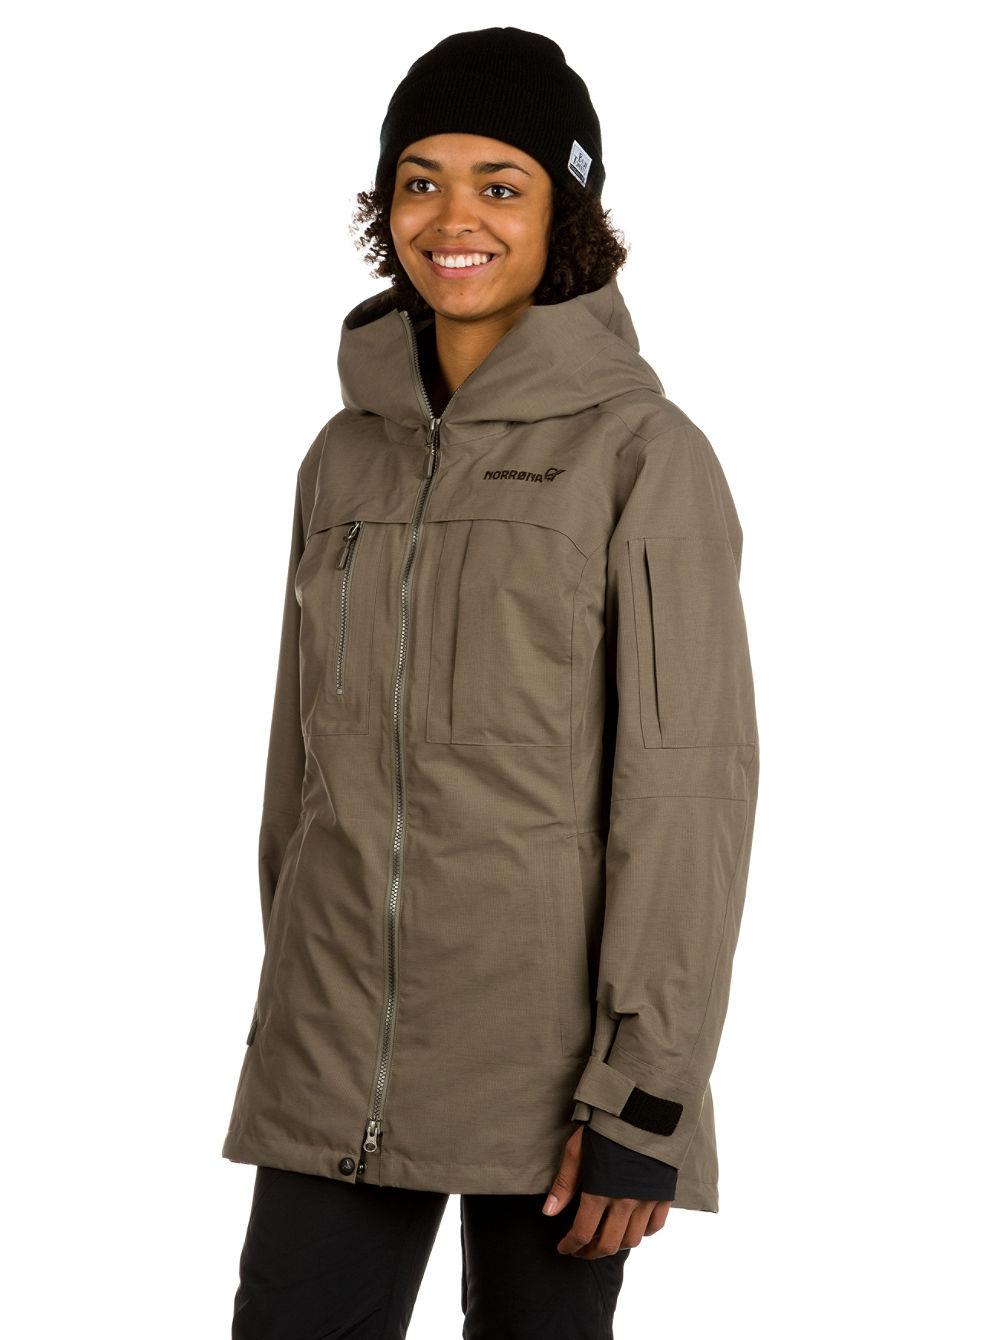 801076c3 Køb Norrona Roldal Gore-Tex PrimaLoft Jacket online hos Blue Tomato